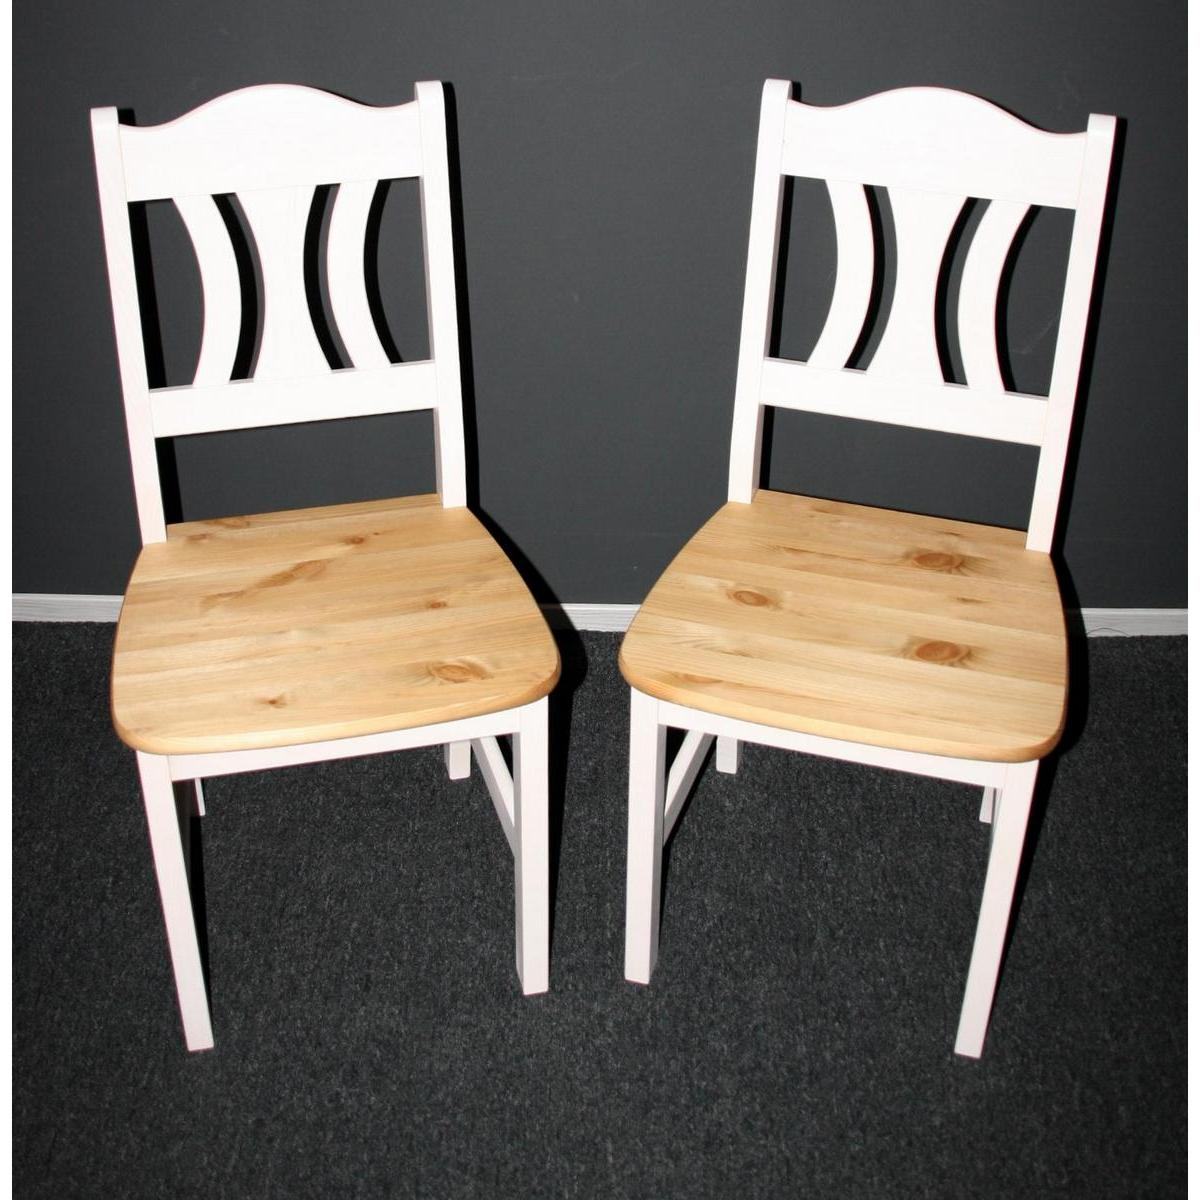 kuchenmobel vom hersteller : Massivholz Stuhl-Set KRISTEL - Kiefer massiv 2-farbig wei? lackiert ...